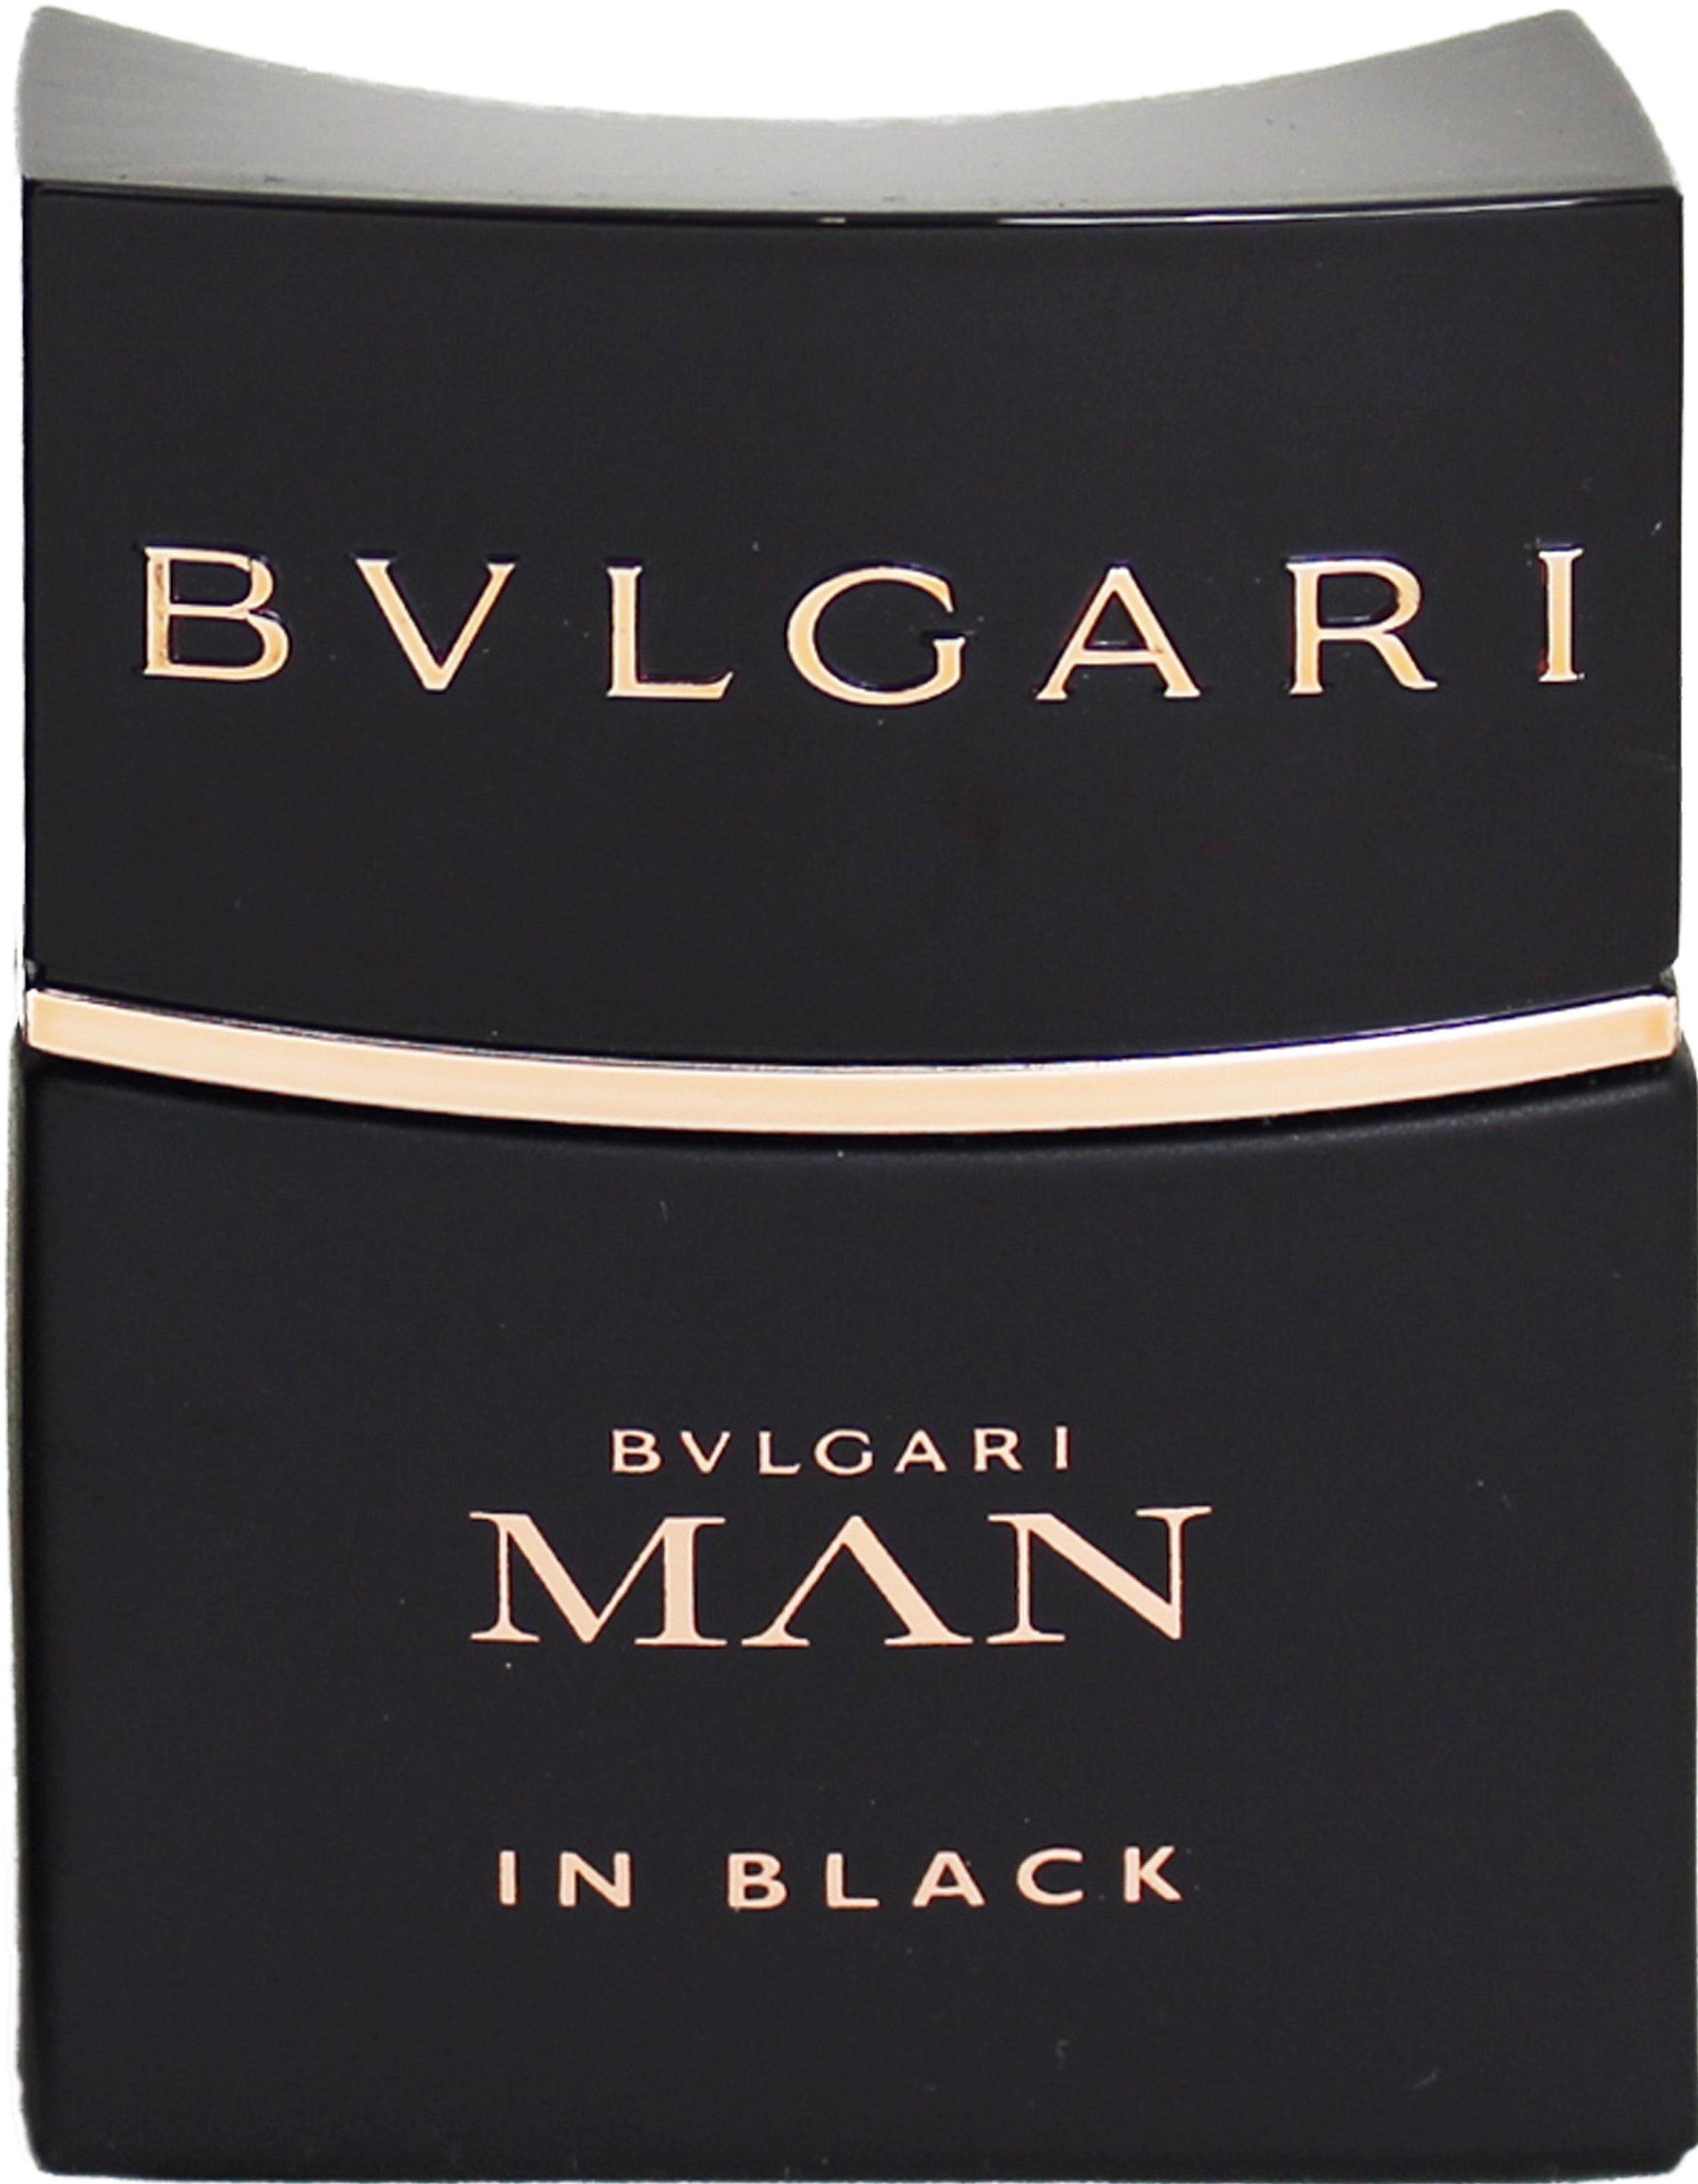 Bvlgari, »Man In Black«, Eau de Parfum